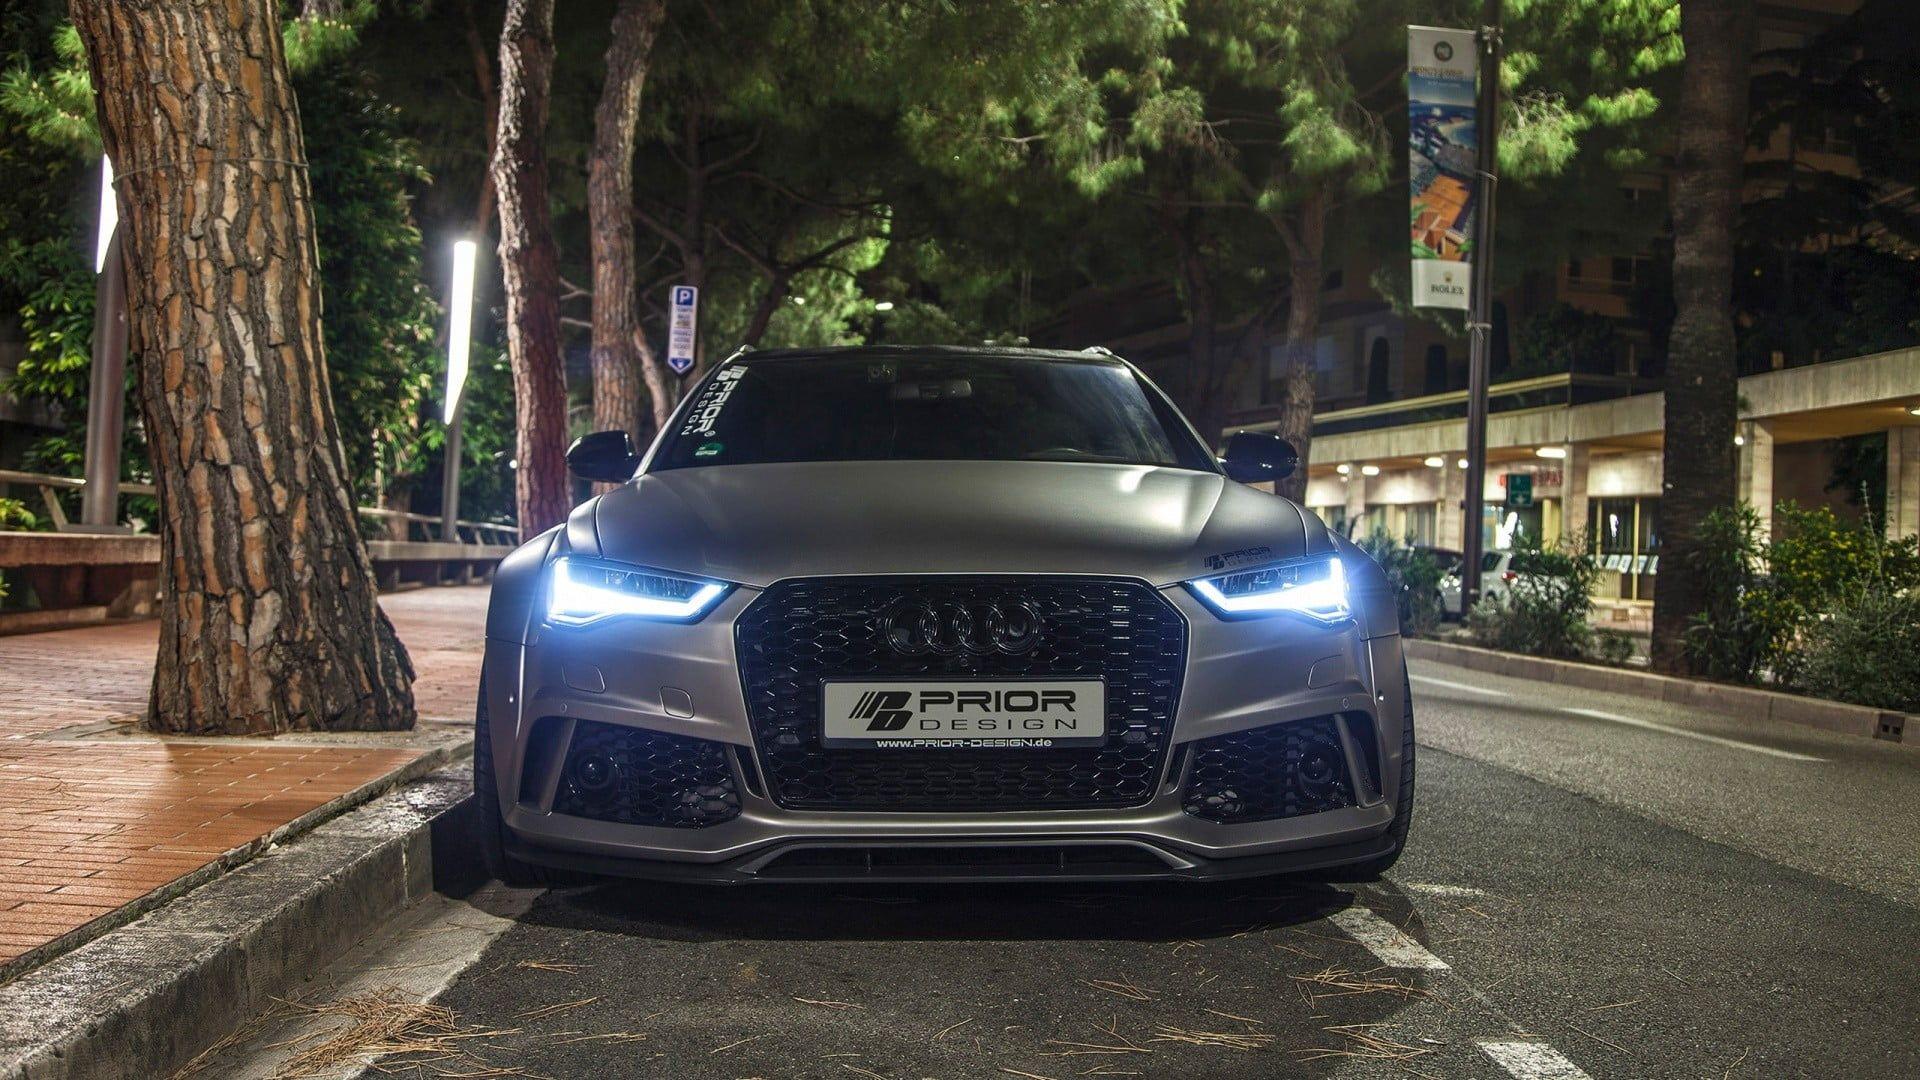 Pin On Audi Cars